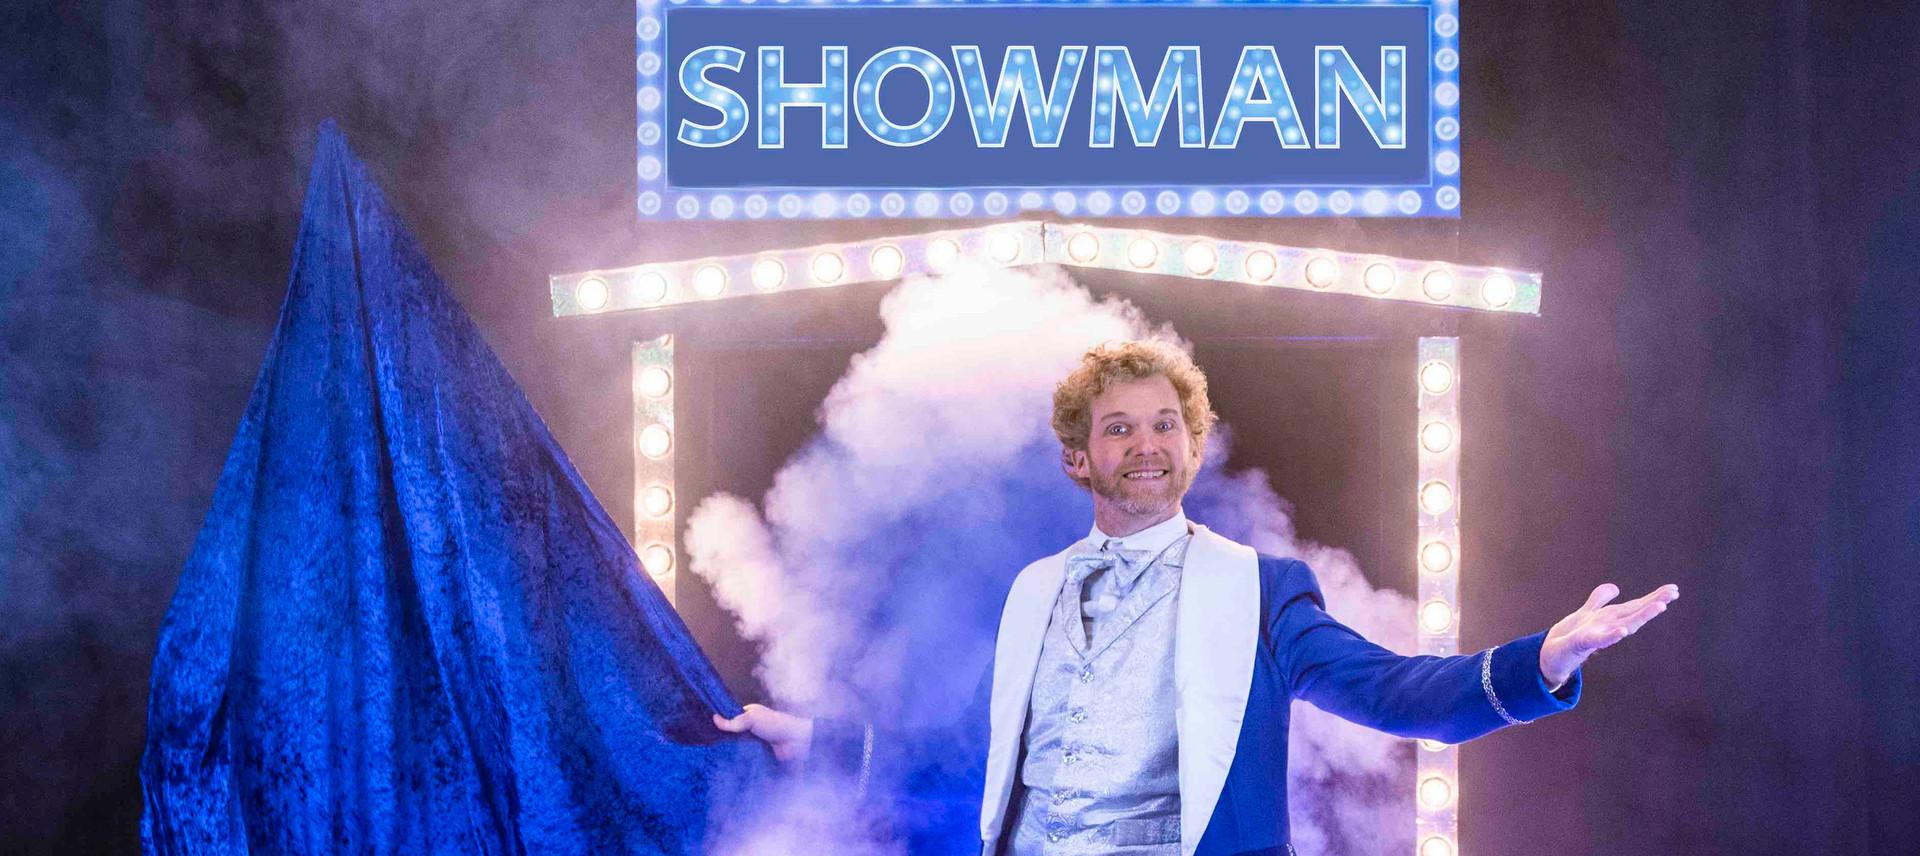 Showman opening act show openinsact open